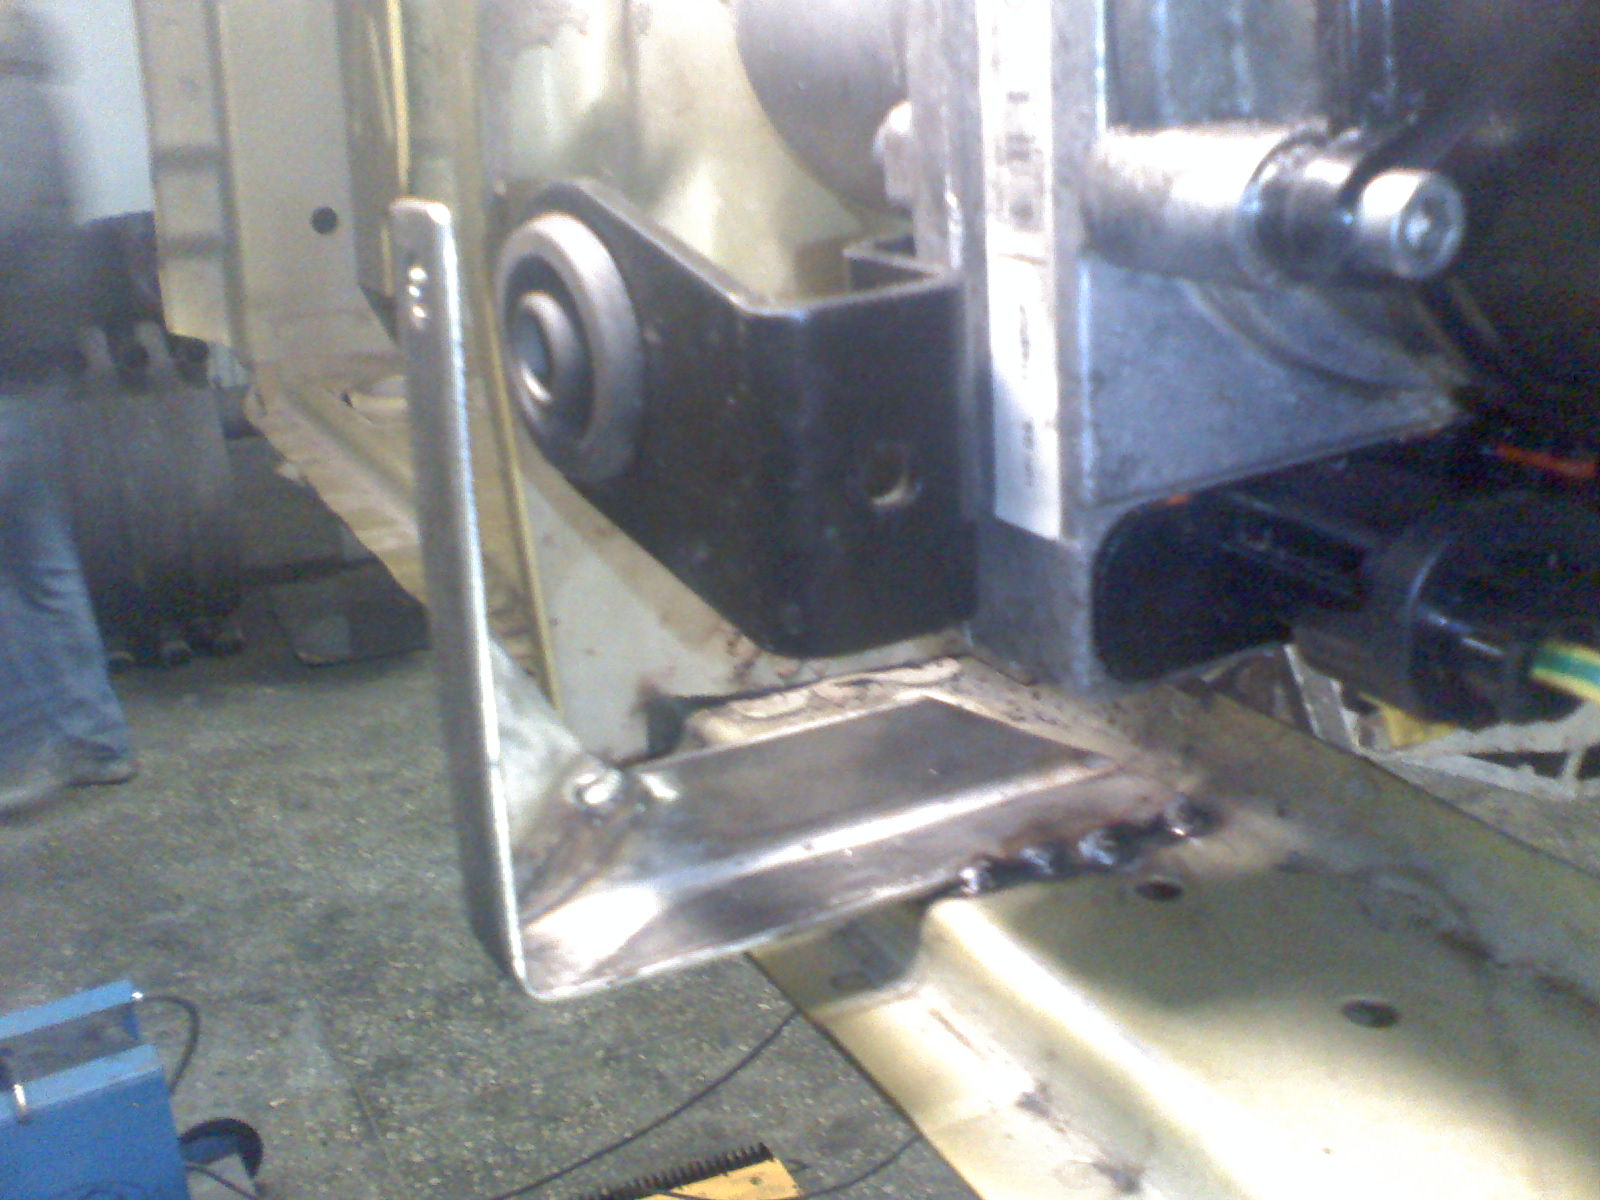 peugeot 307 power steering pump wiring diagram 3e electric hr v power [ 1600 x 1200 Pixel ]